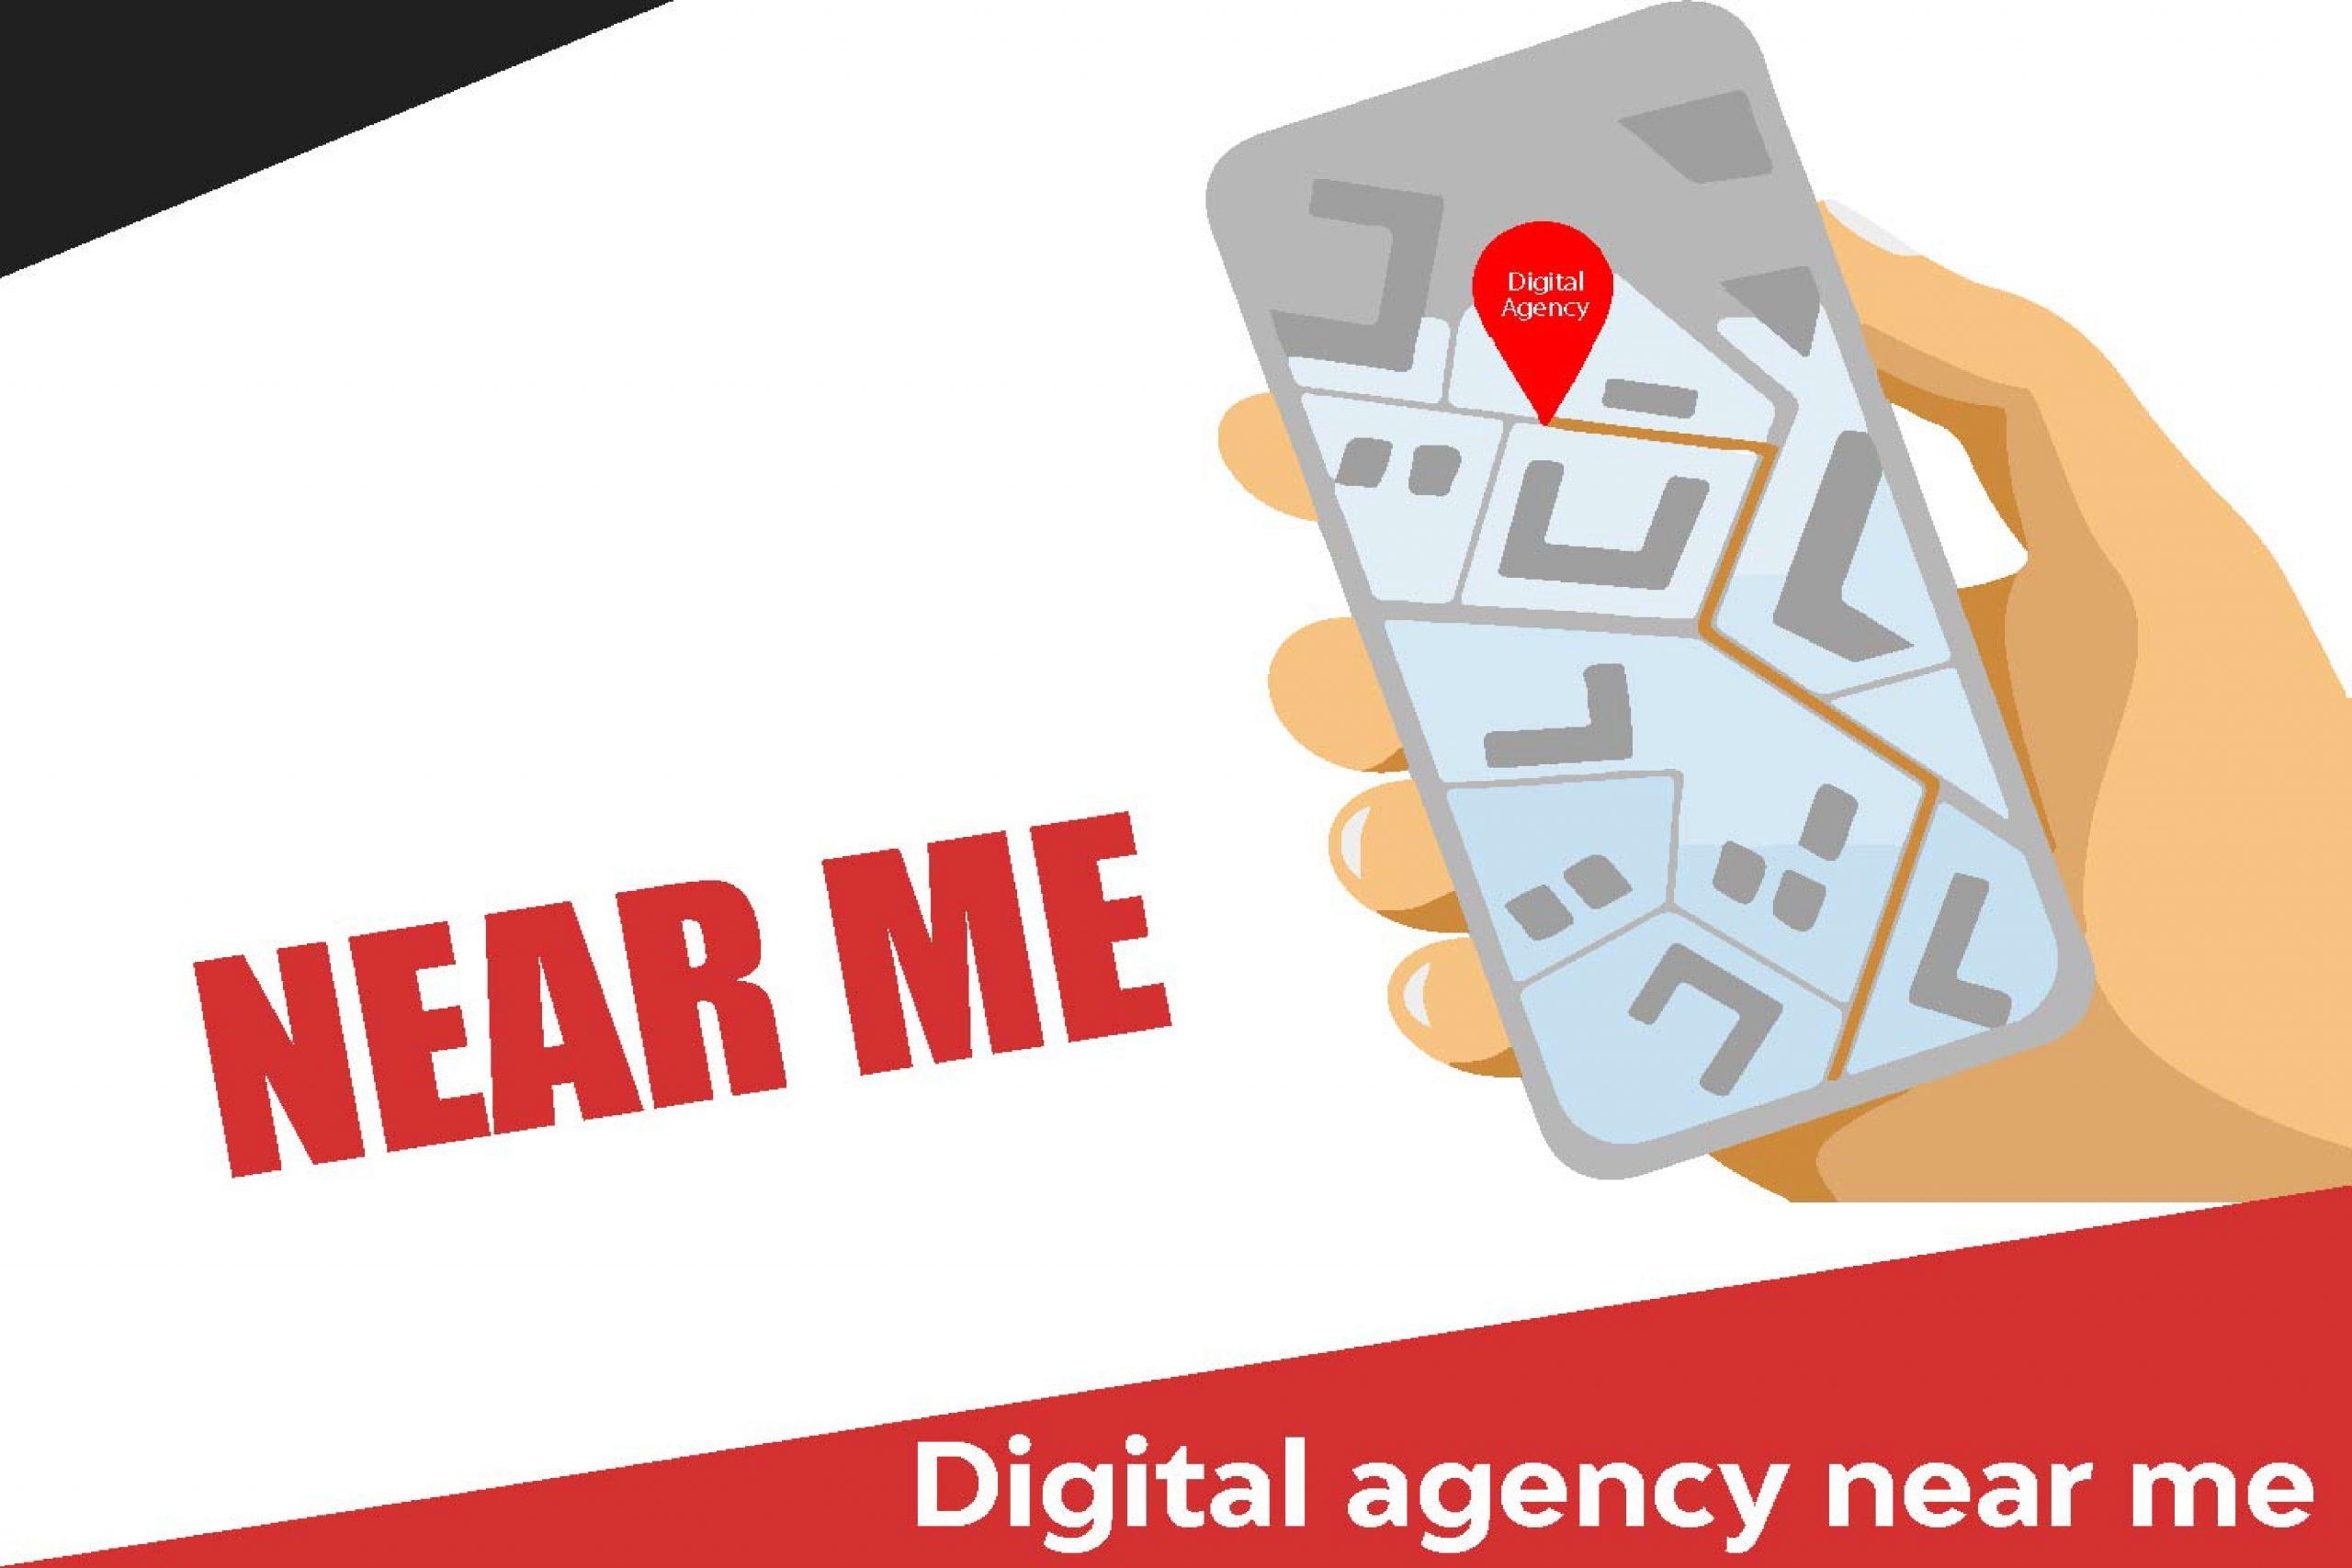 Digital Agency near me